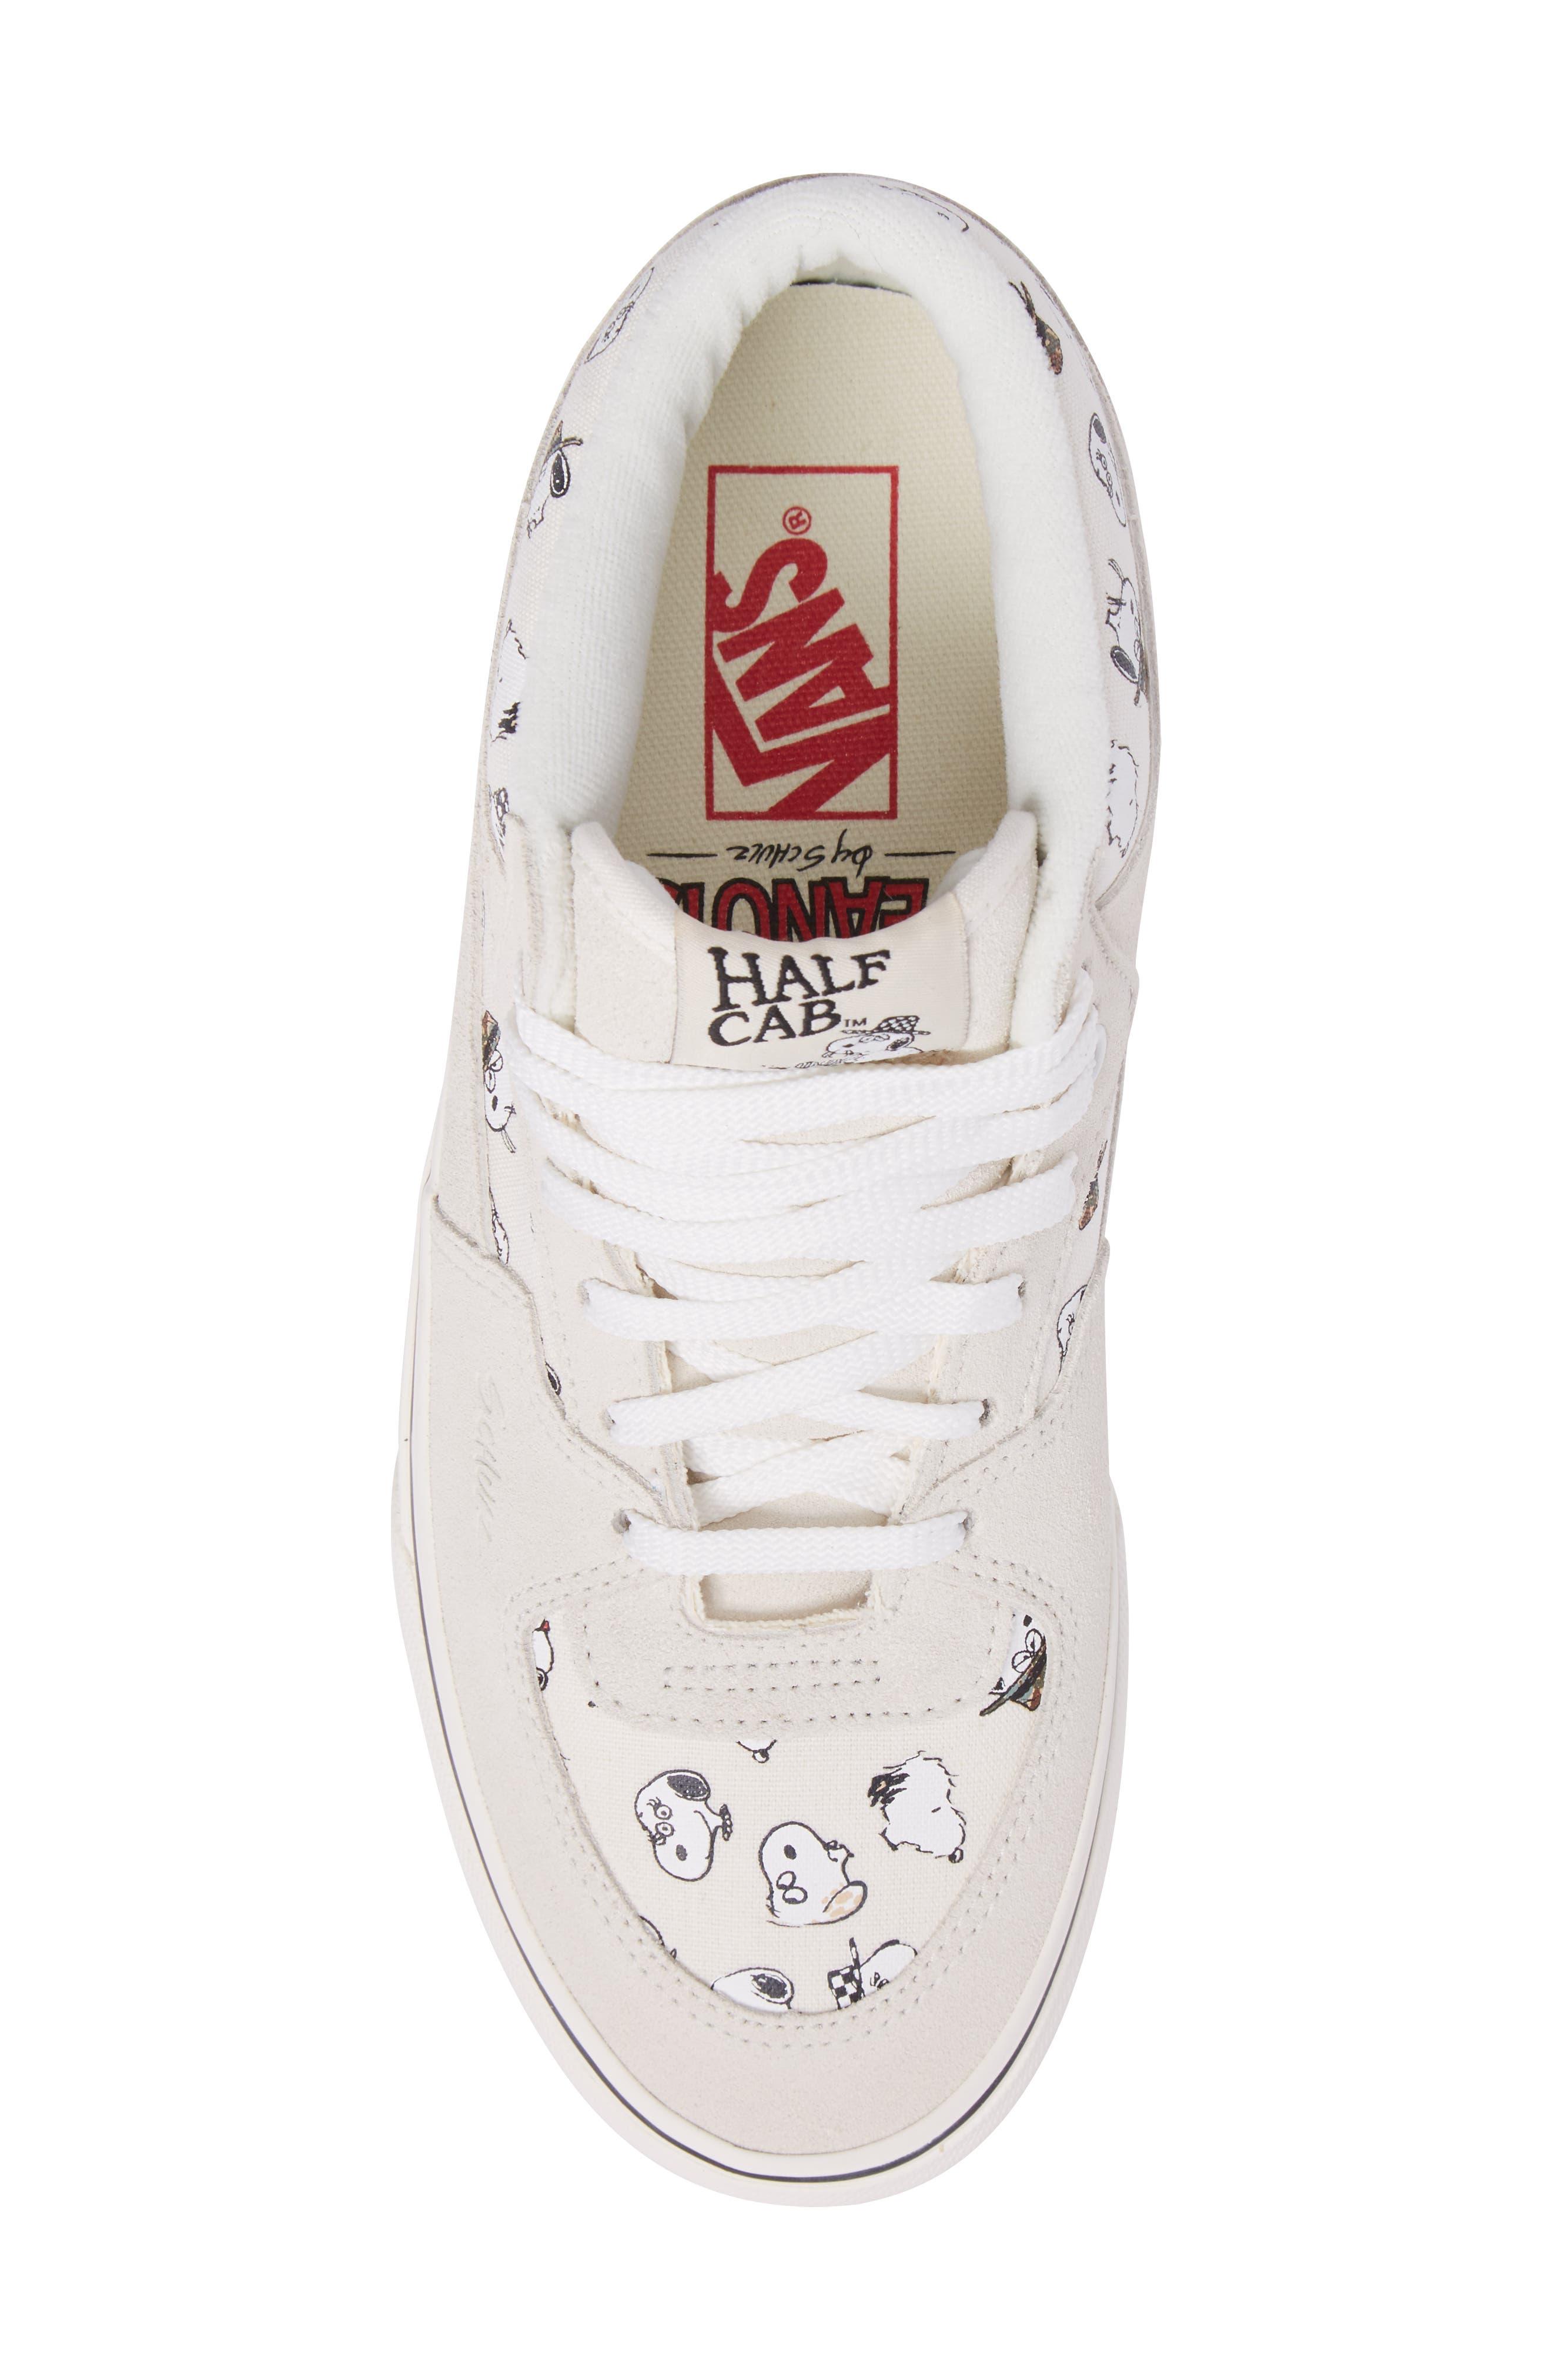 x Peanuts<sup>®</sup> Half Cab Sneaker,                             Alternate thumbnail 5, color,                             100